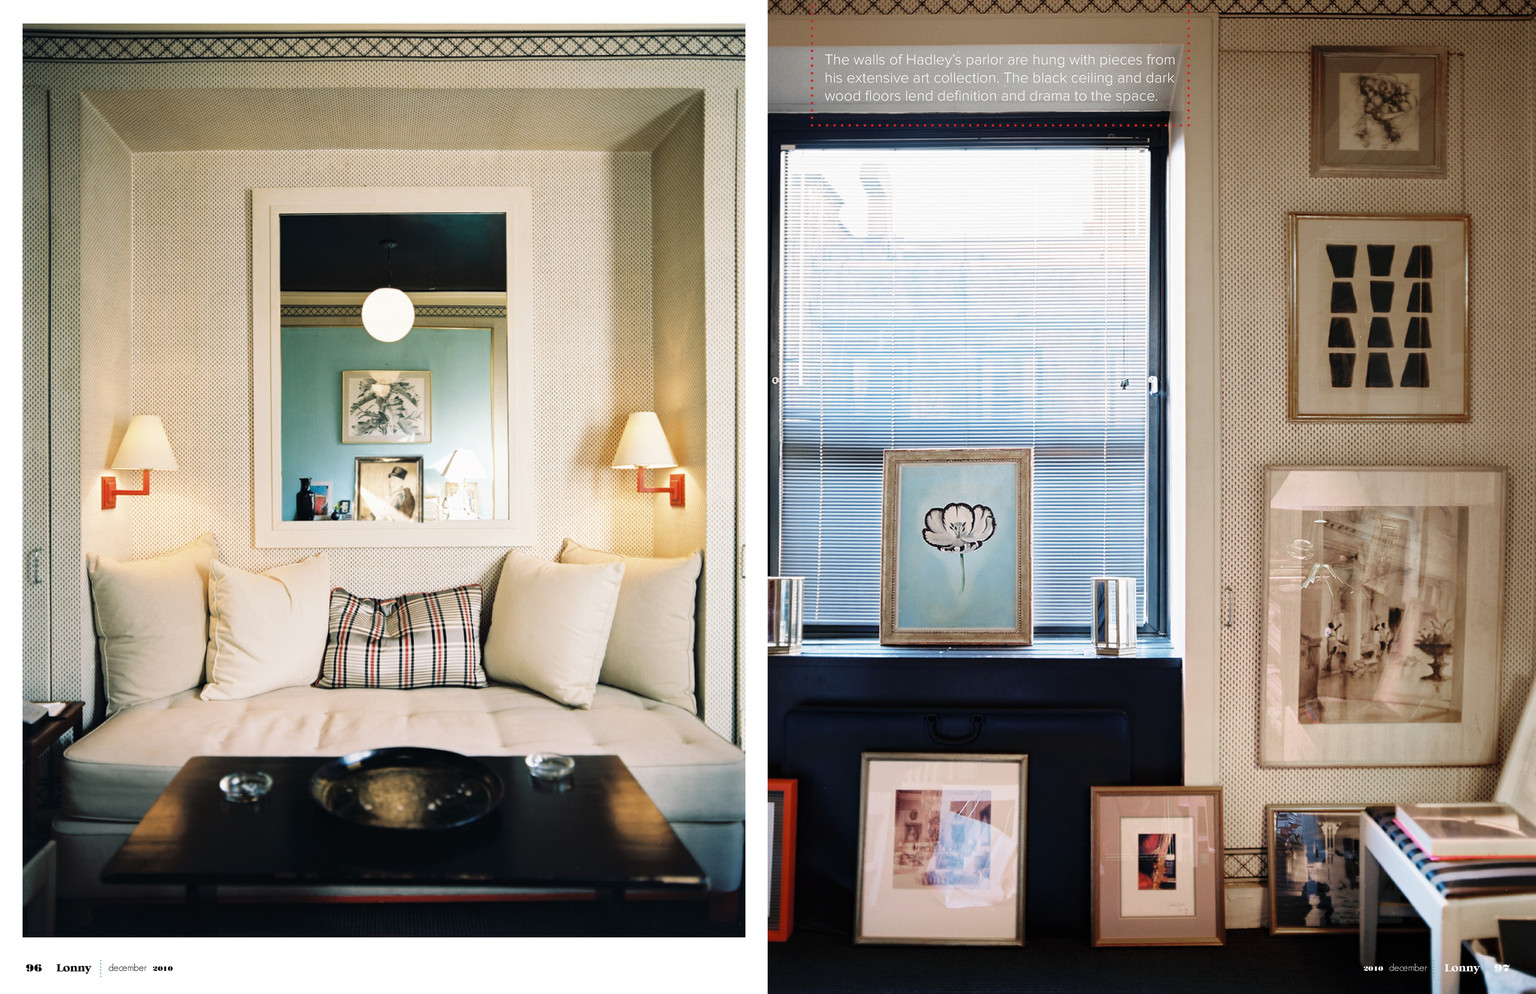 albert-hadley-living-room-blue-3.jpg